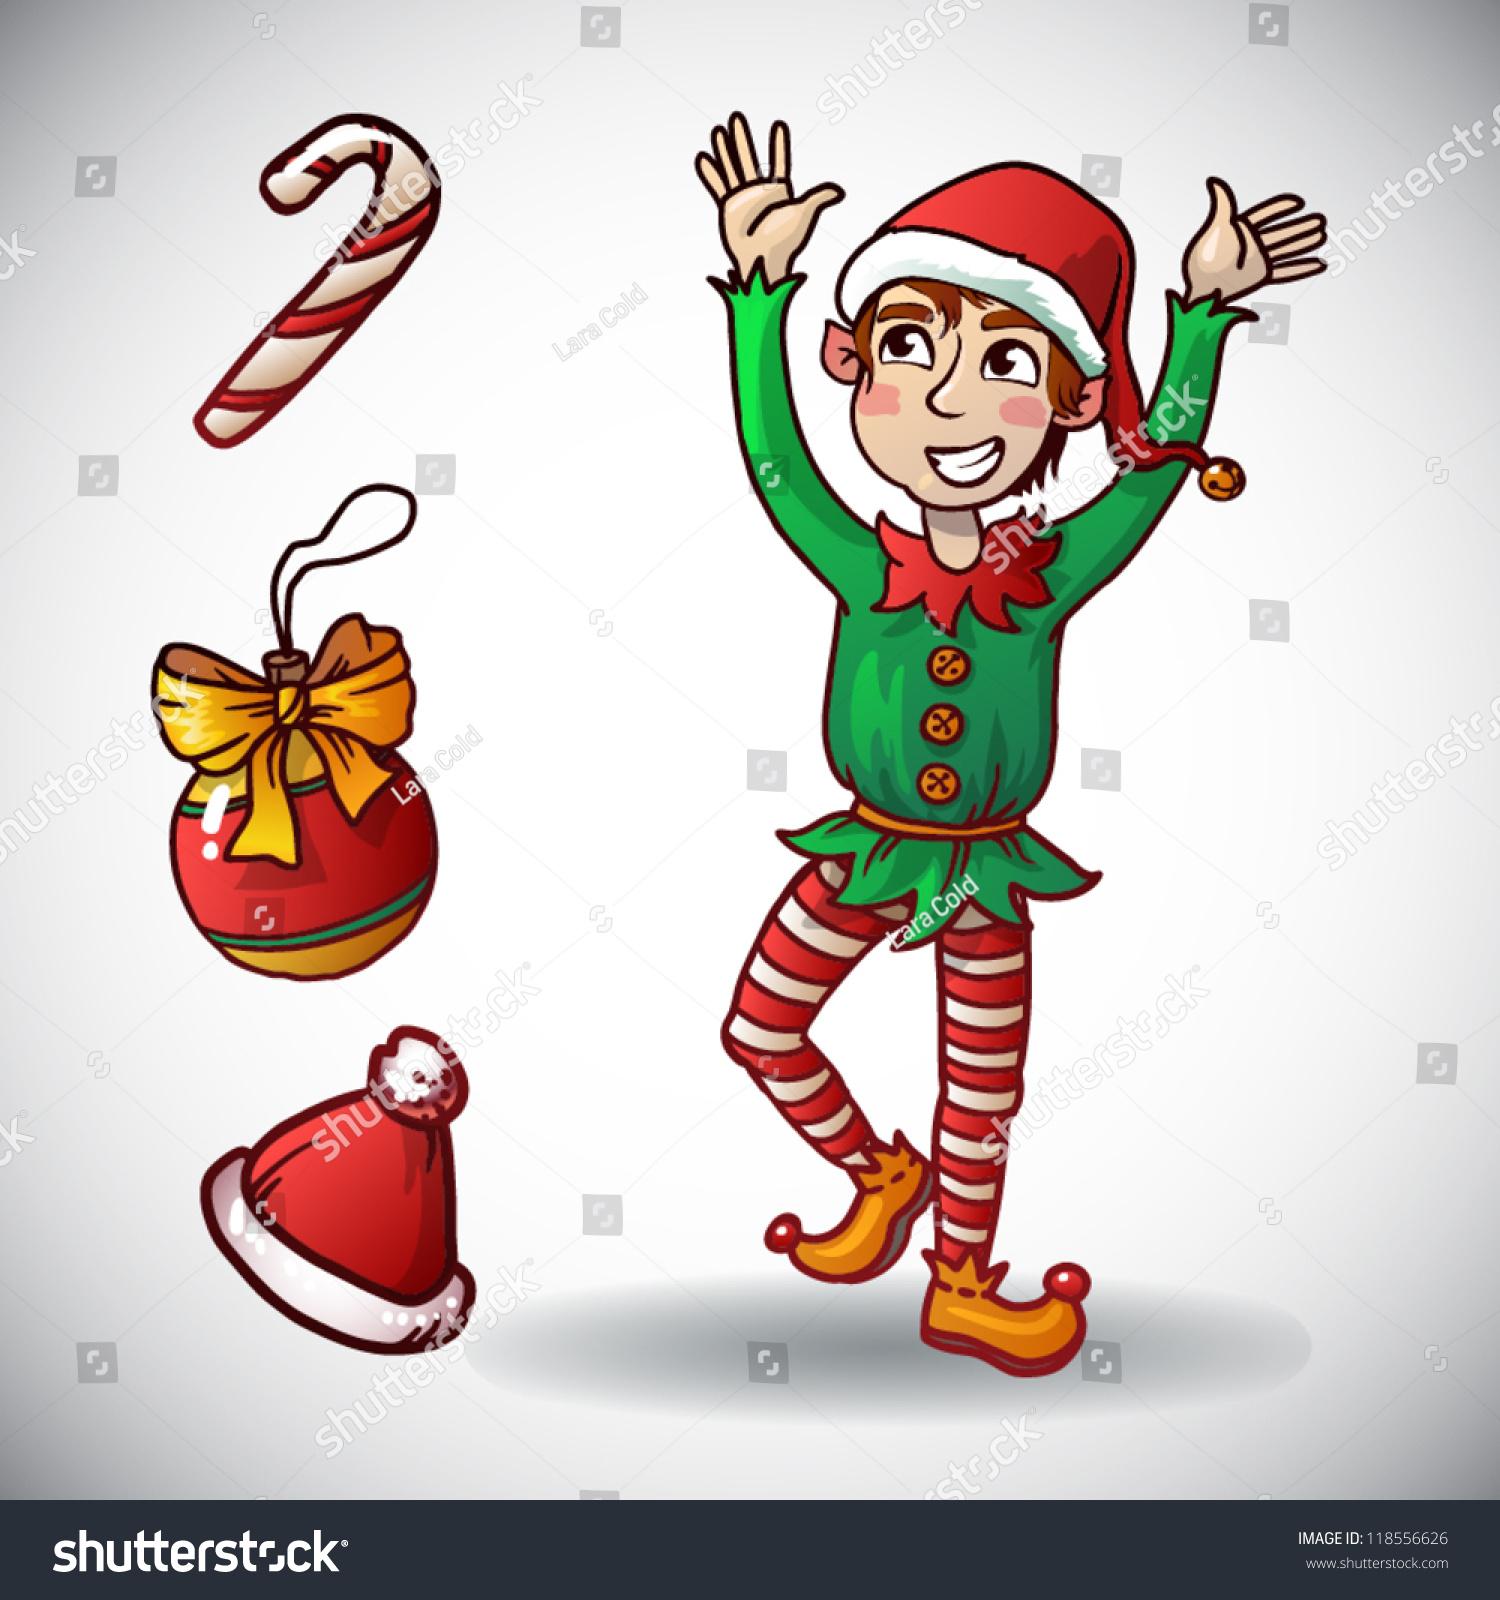 Christmas Elf Funny Holiday Character Vector Stock Vector (Royalty ...